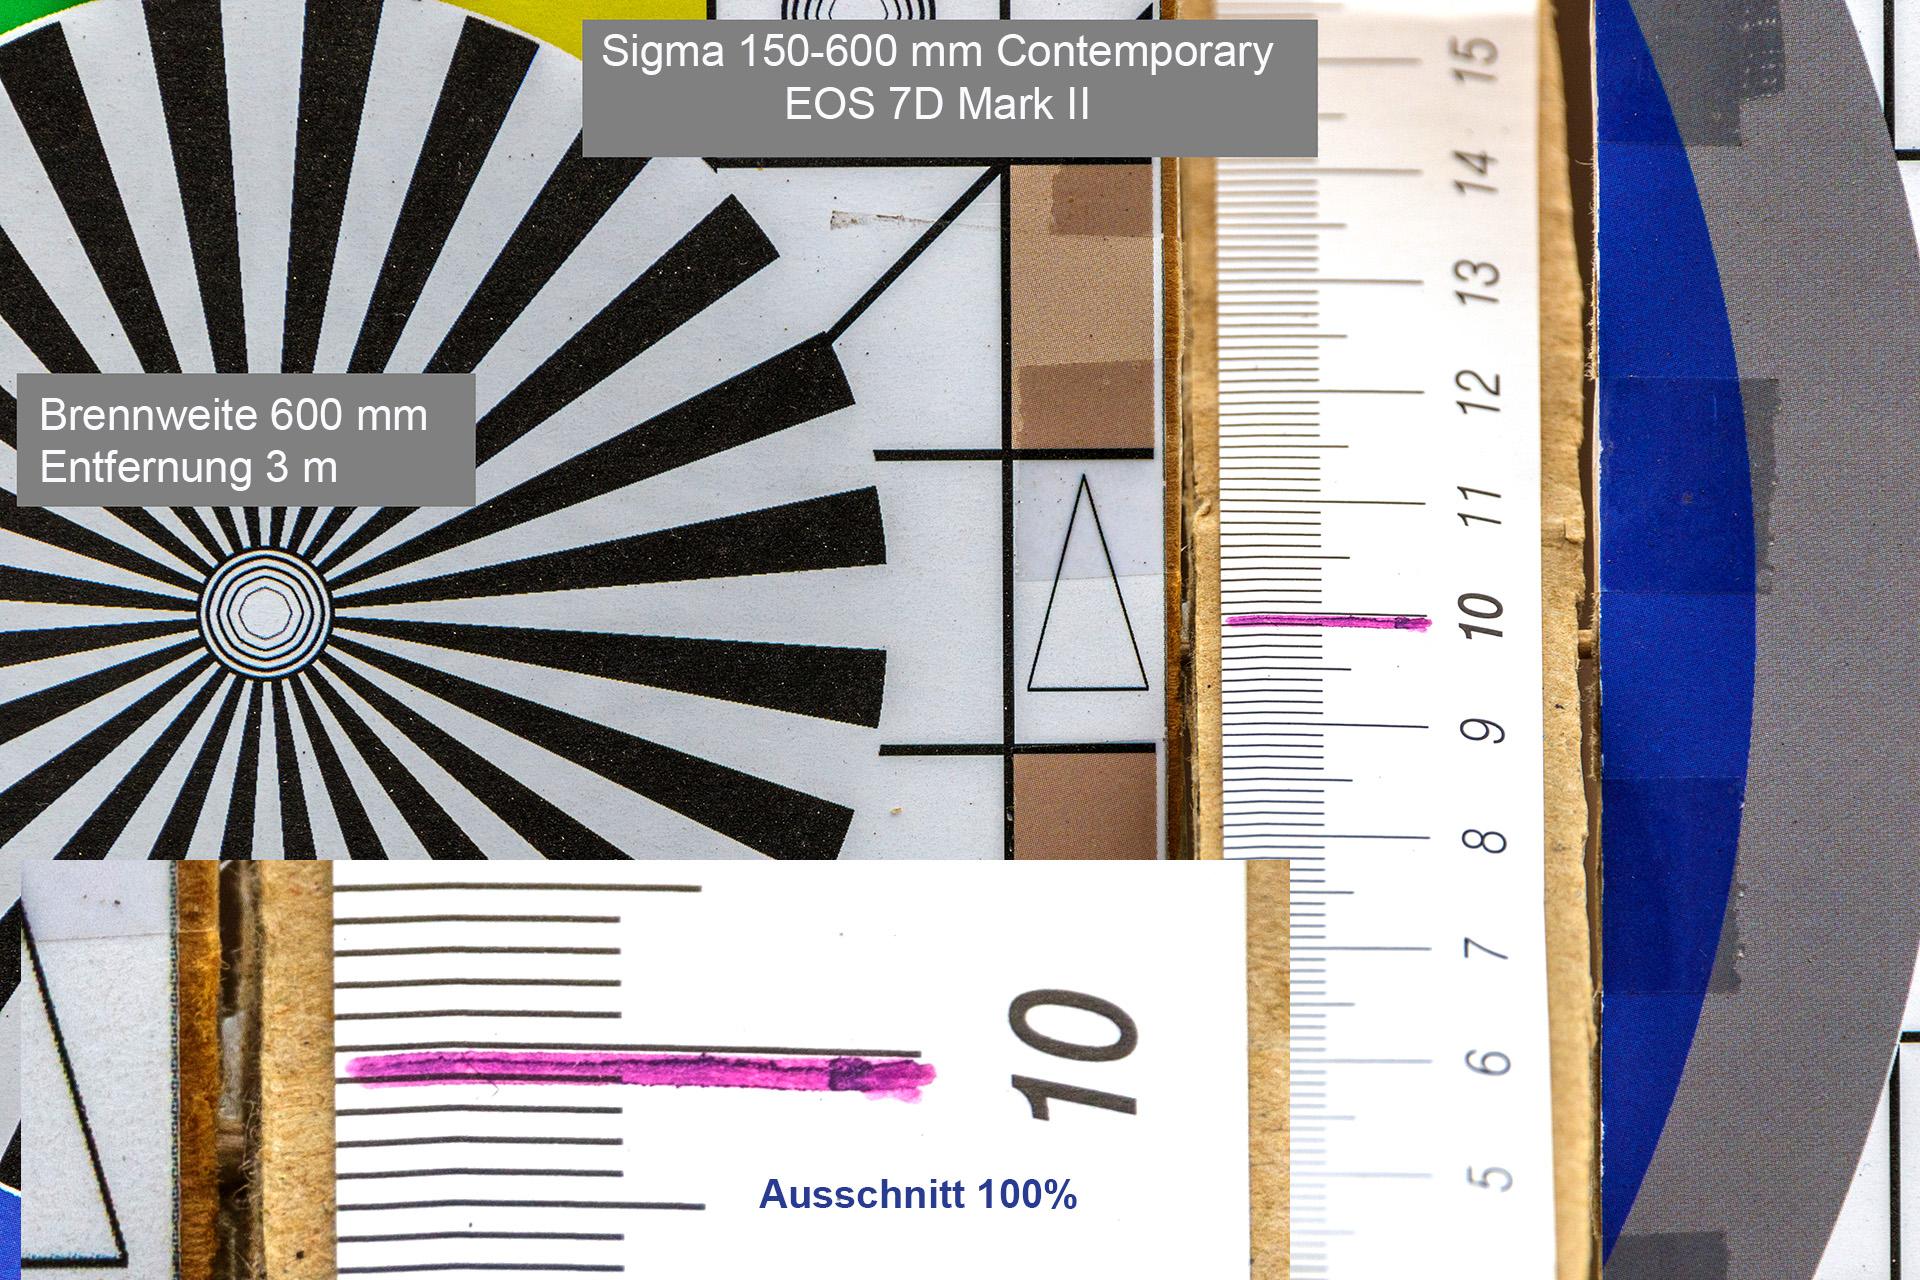 Testaufnahmen, Sigma 150-600 mm, 7D Mark II, 3 Meter, 600 mm